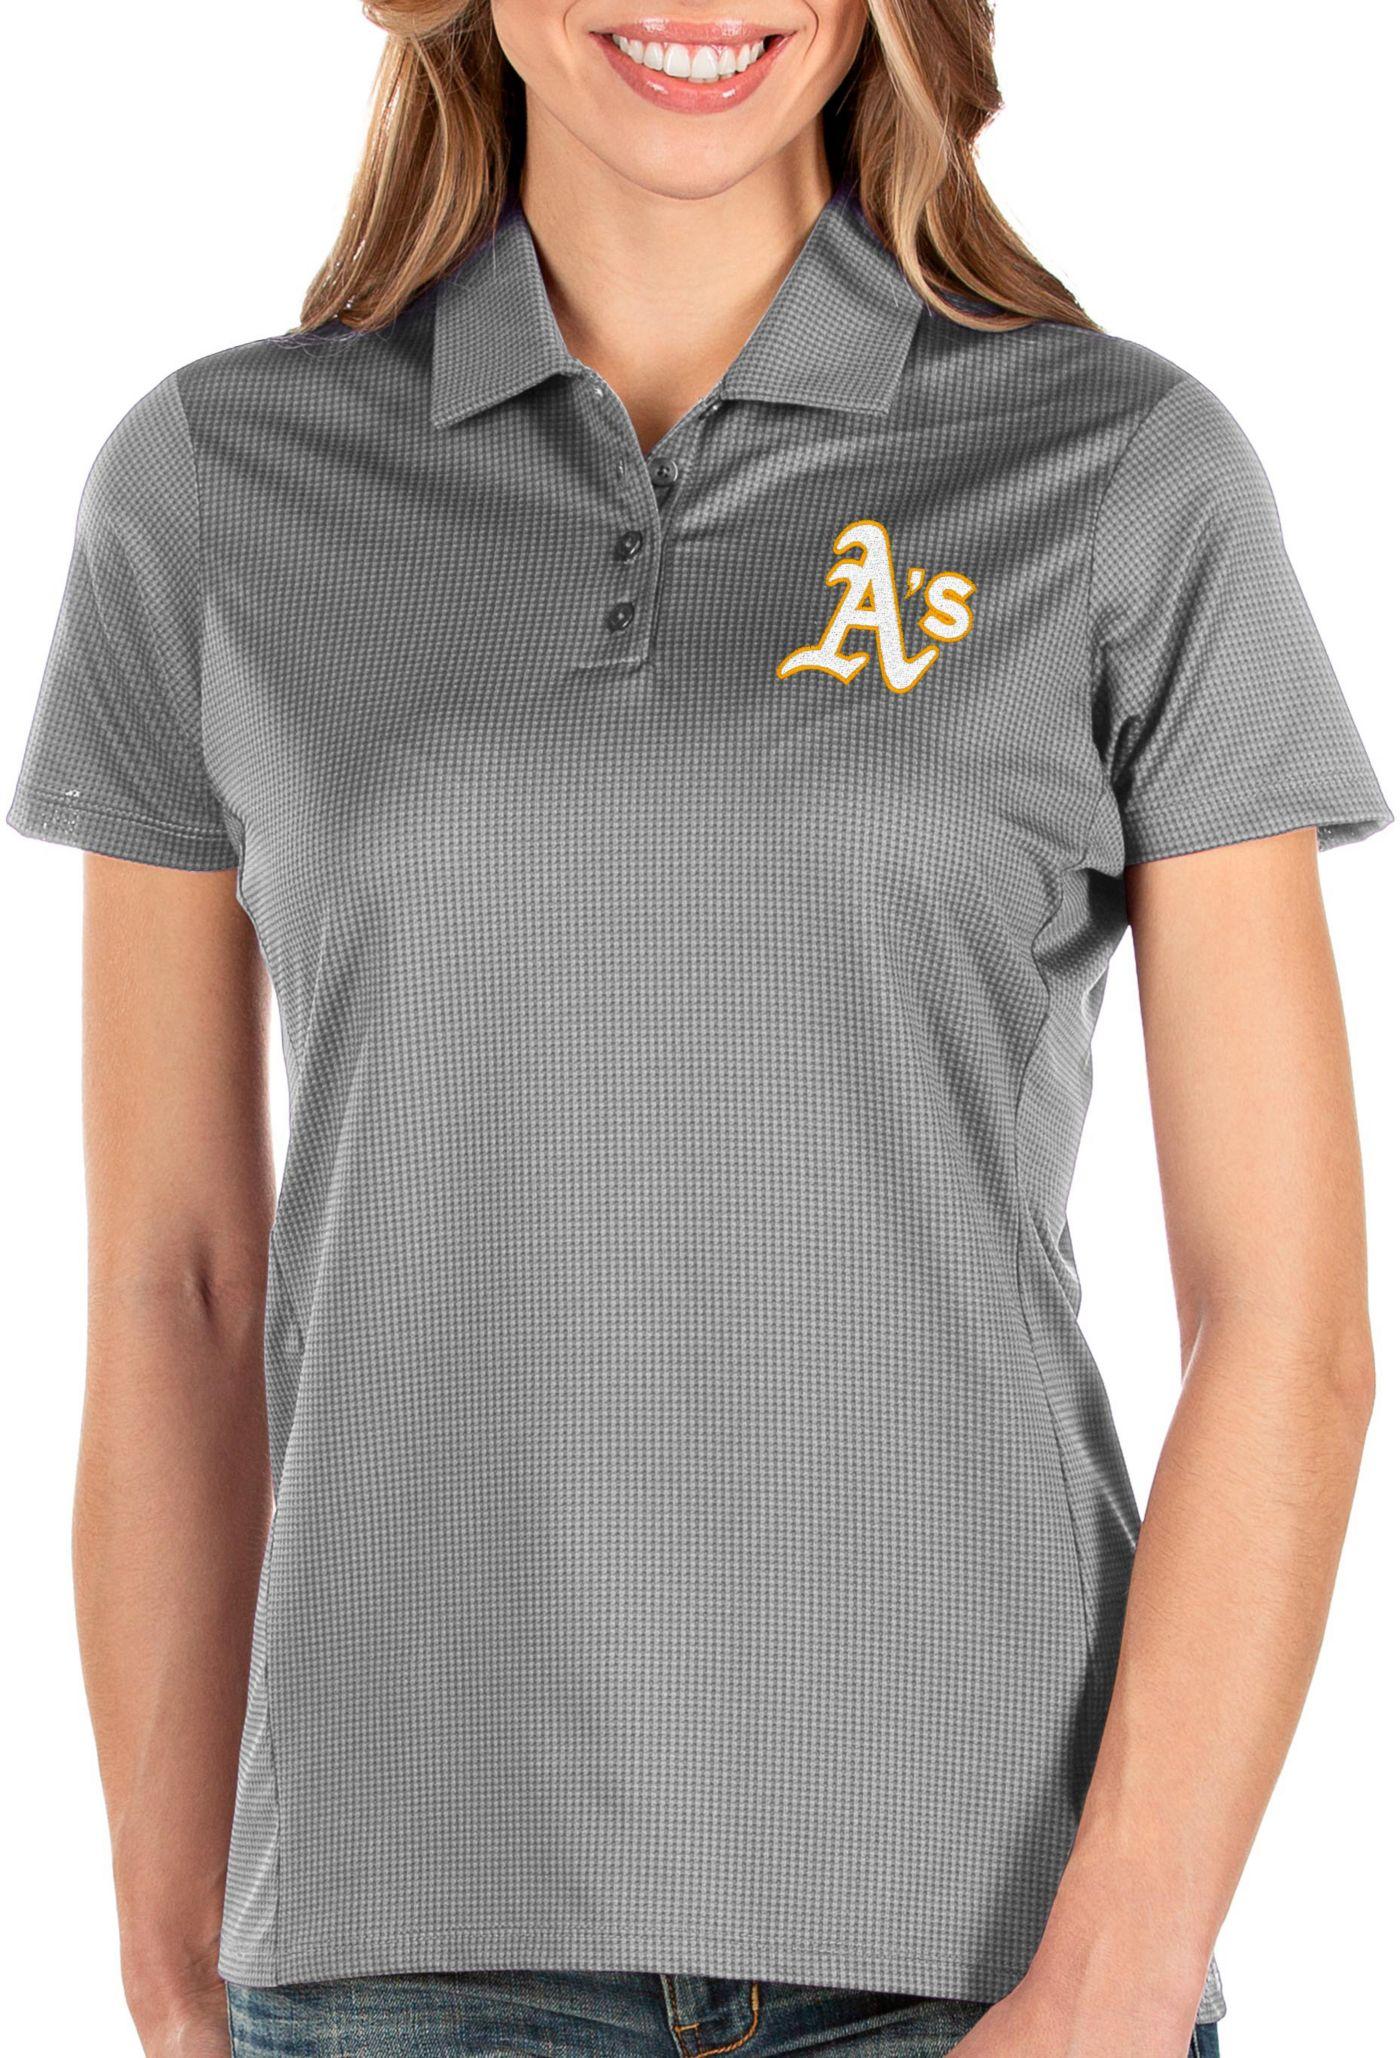 Antigua Women's Oakland Athletics Grey Balance Polo